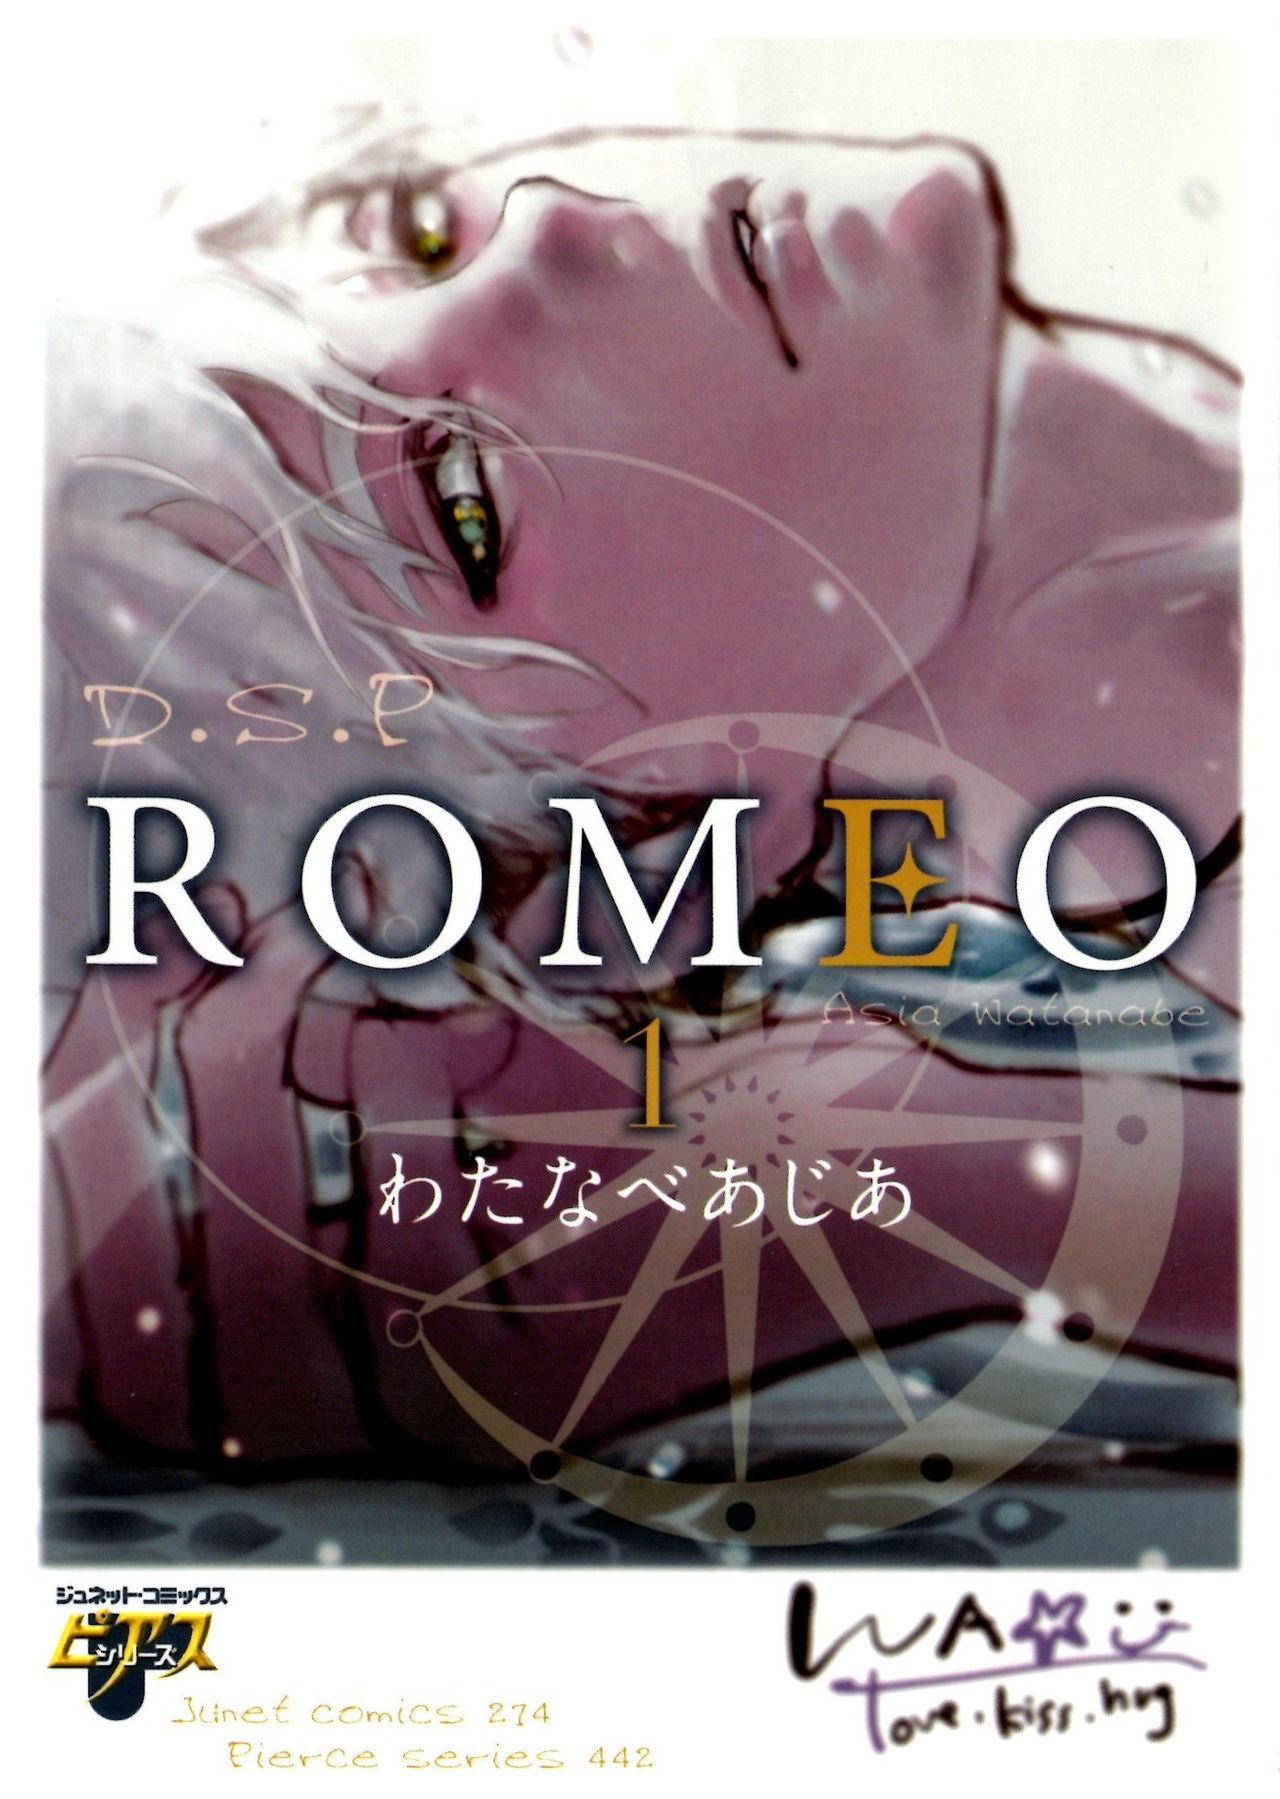 D.S.P Romeo 0